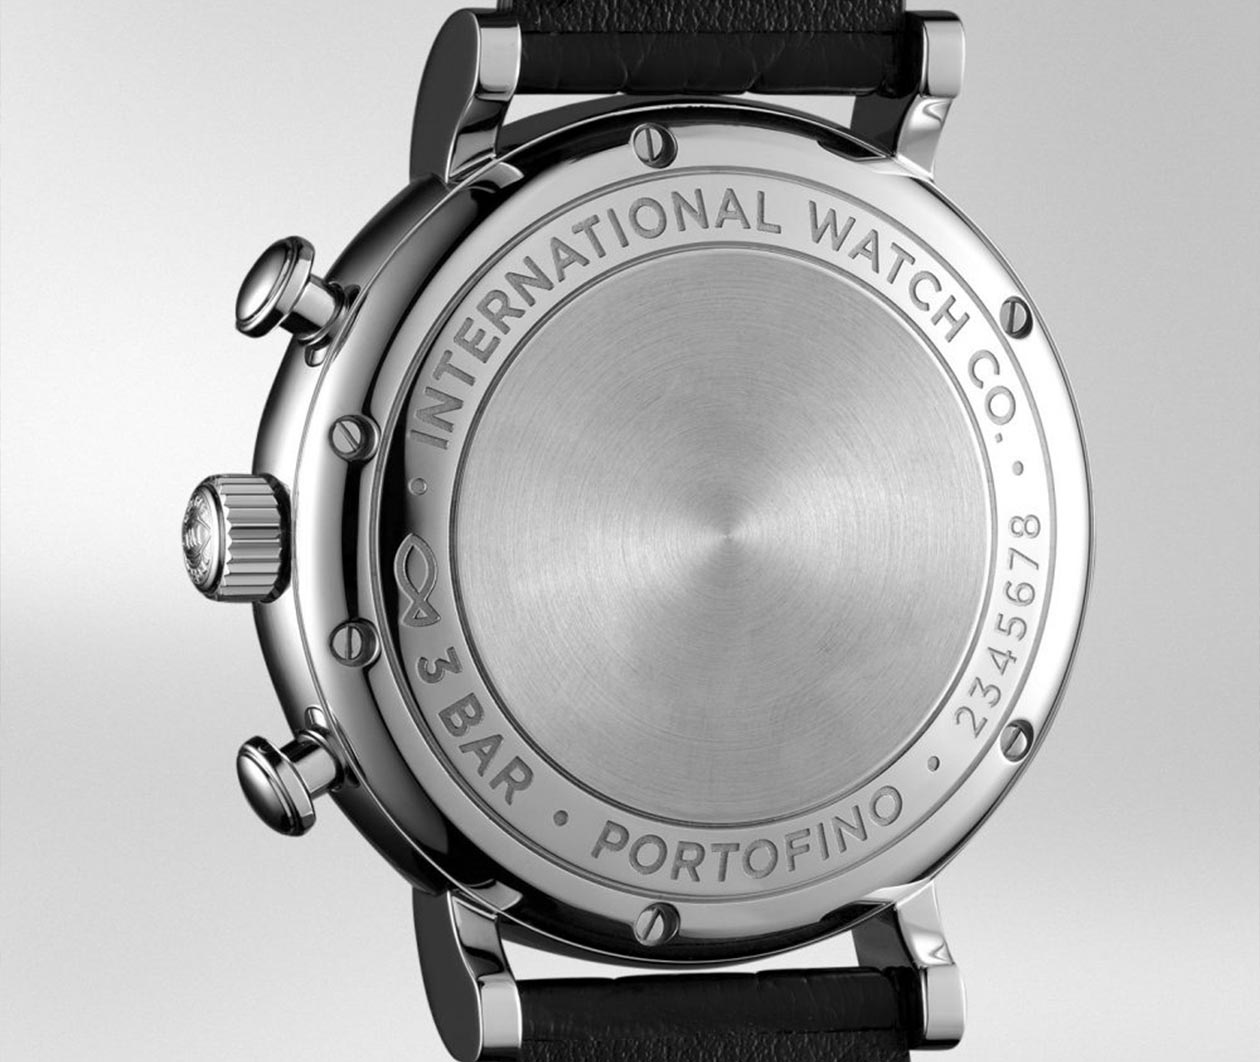 IWC Portofino Chronograph IW391036 Carousel 5 FINAL